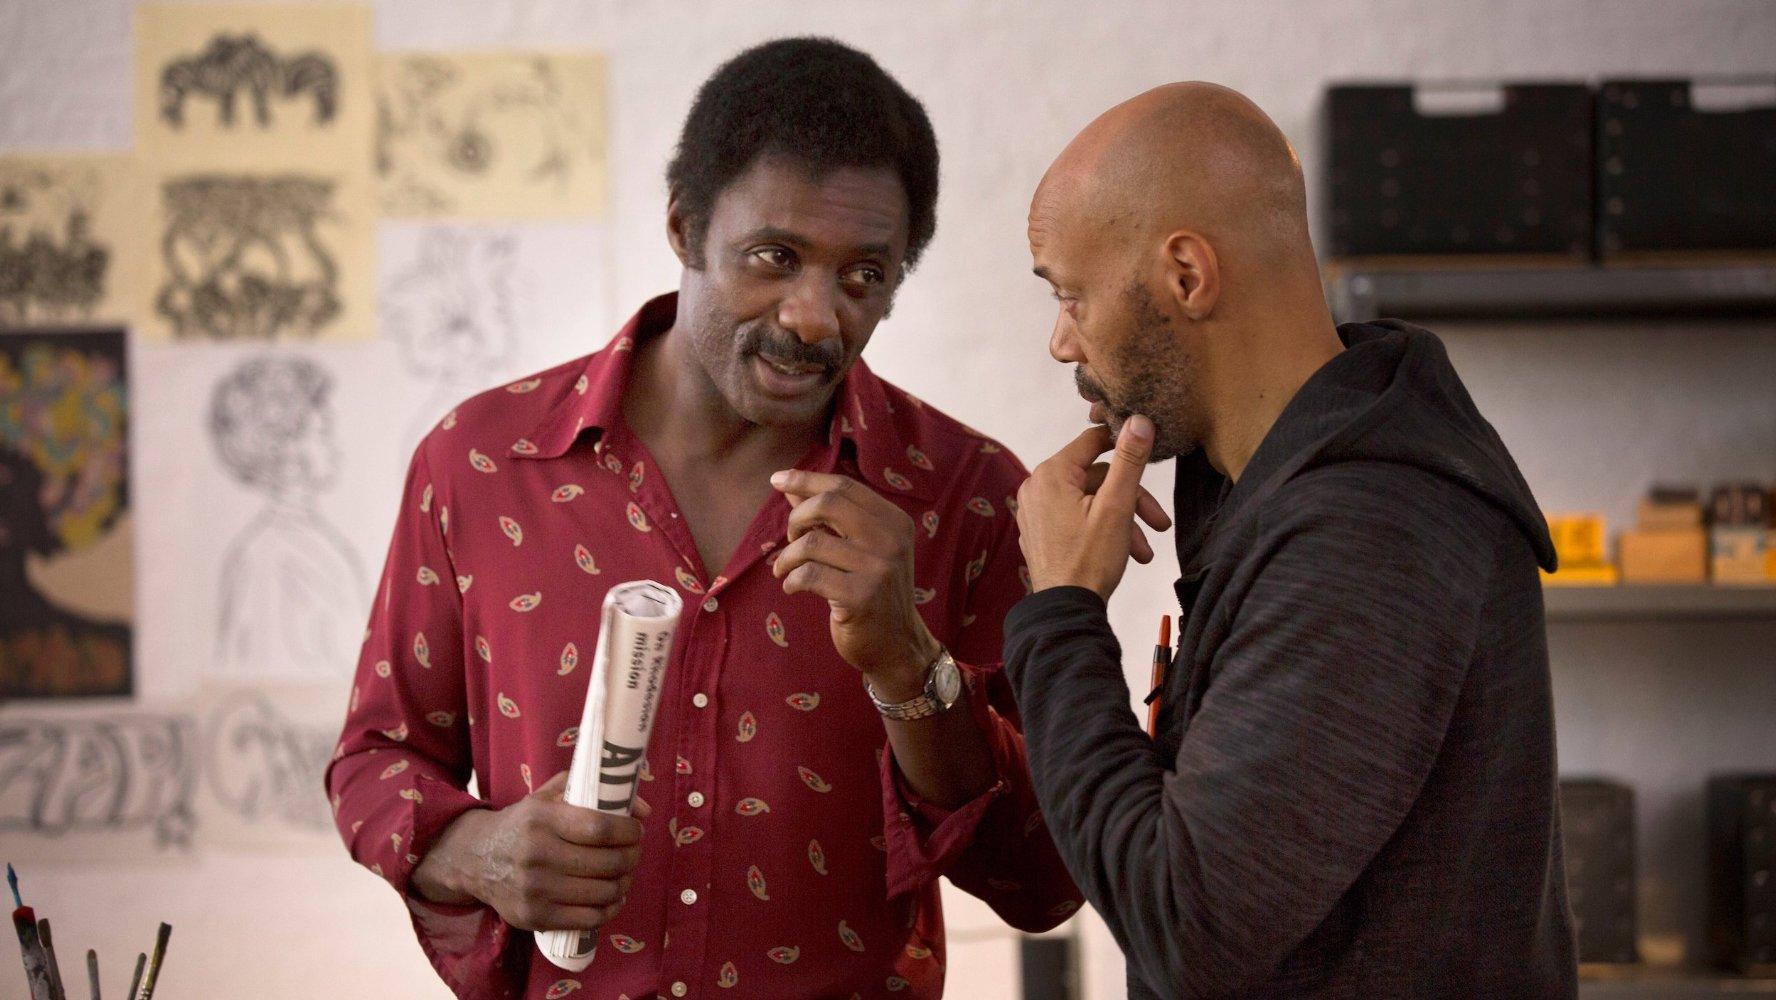 Idris Elba and John Ridley on the set of Guerrilla. Photo: IMDB.